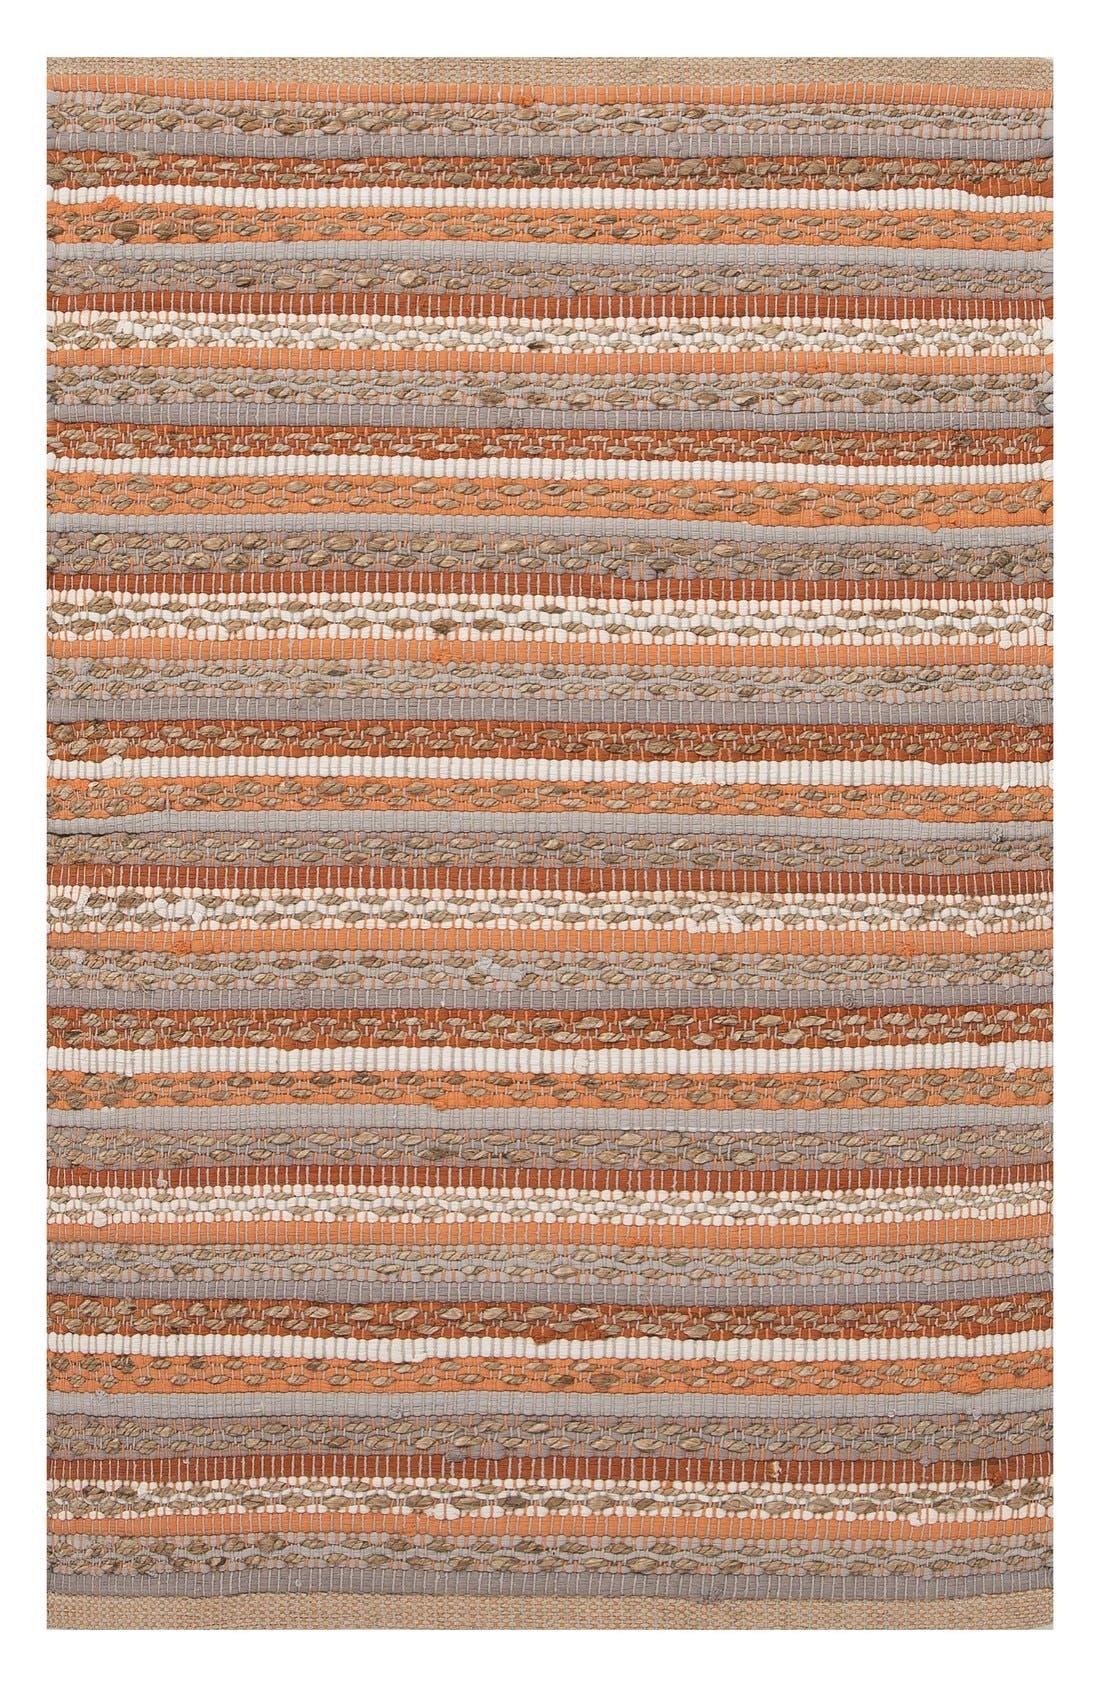 Alternate Image 1 Selected - Jaipur 'Croydon' Cotton & Jute Accent Rug